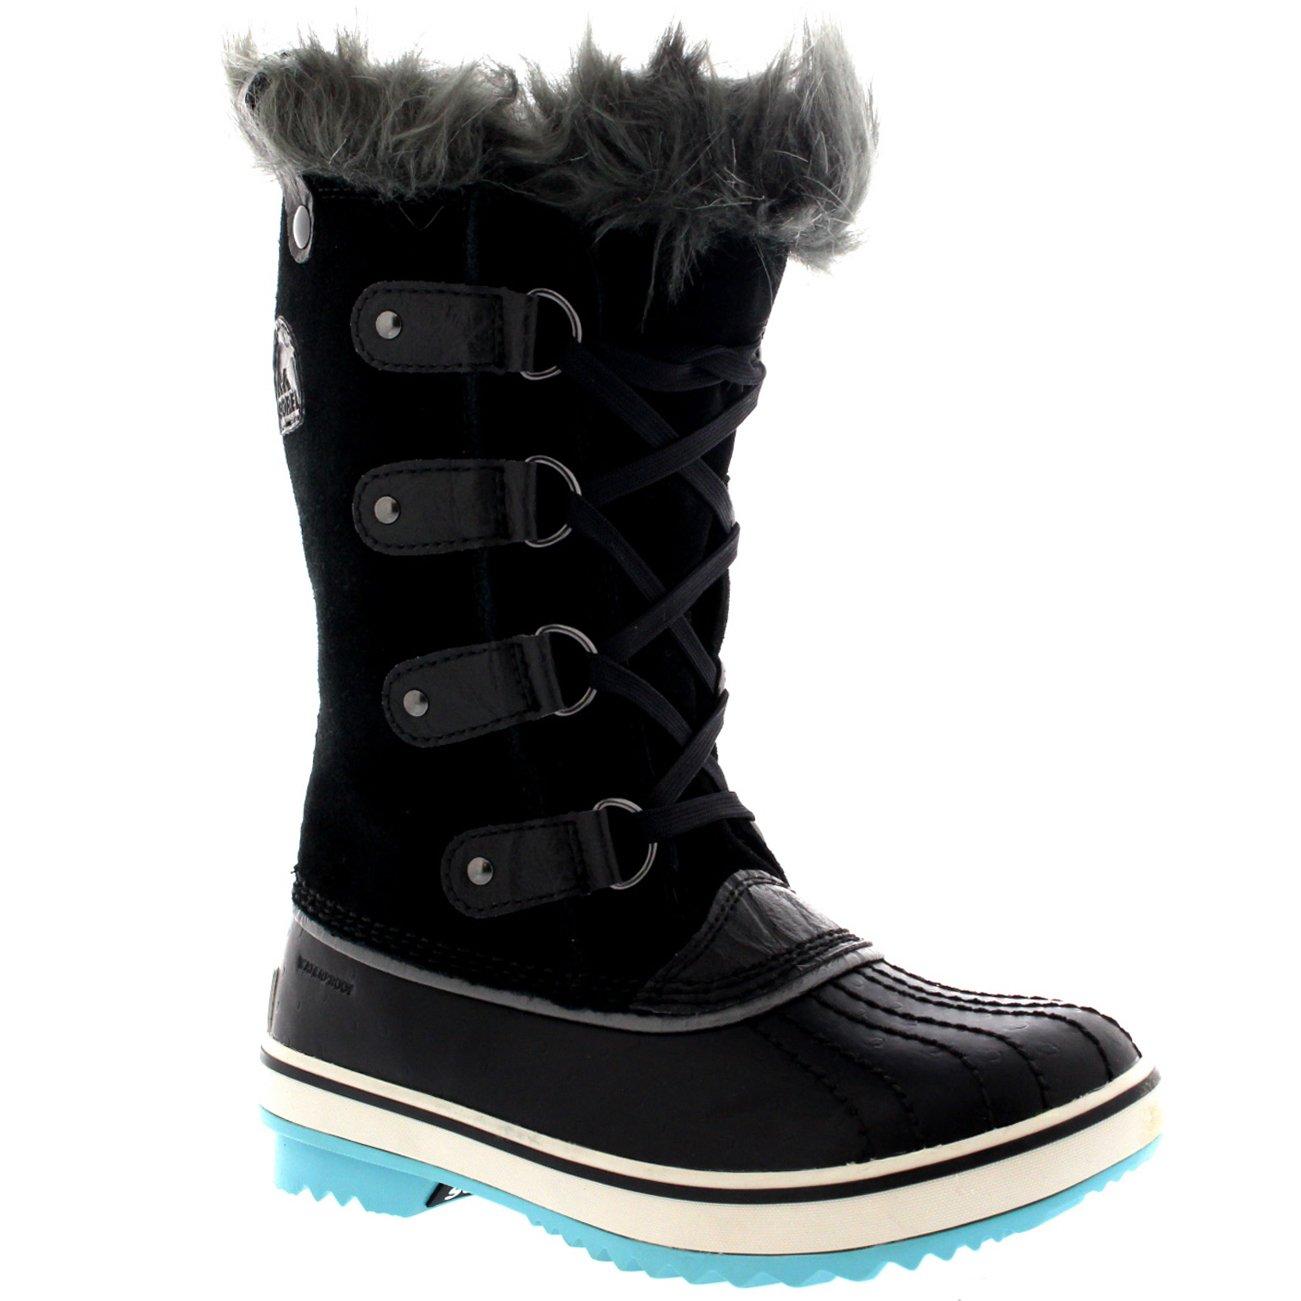 Sorel Girls Youth Tofino Black Iceberg Winter Boot - 7